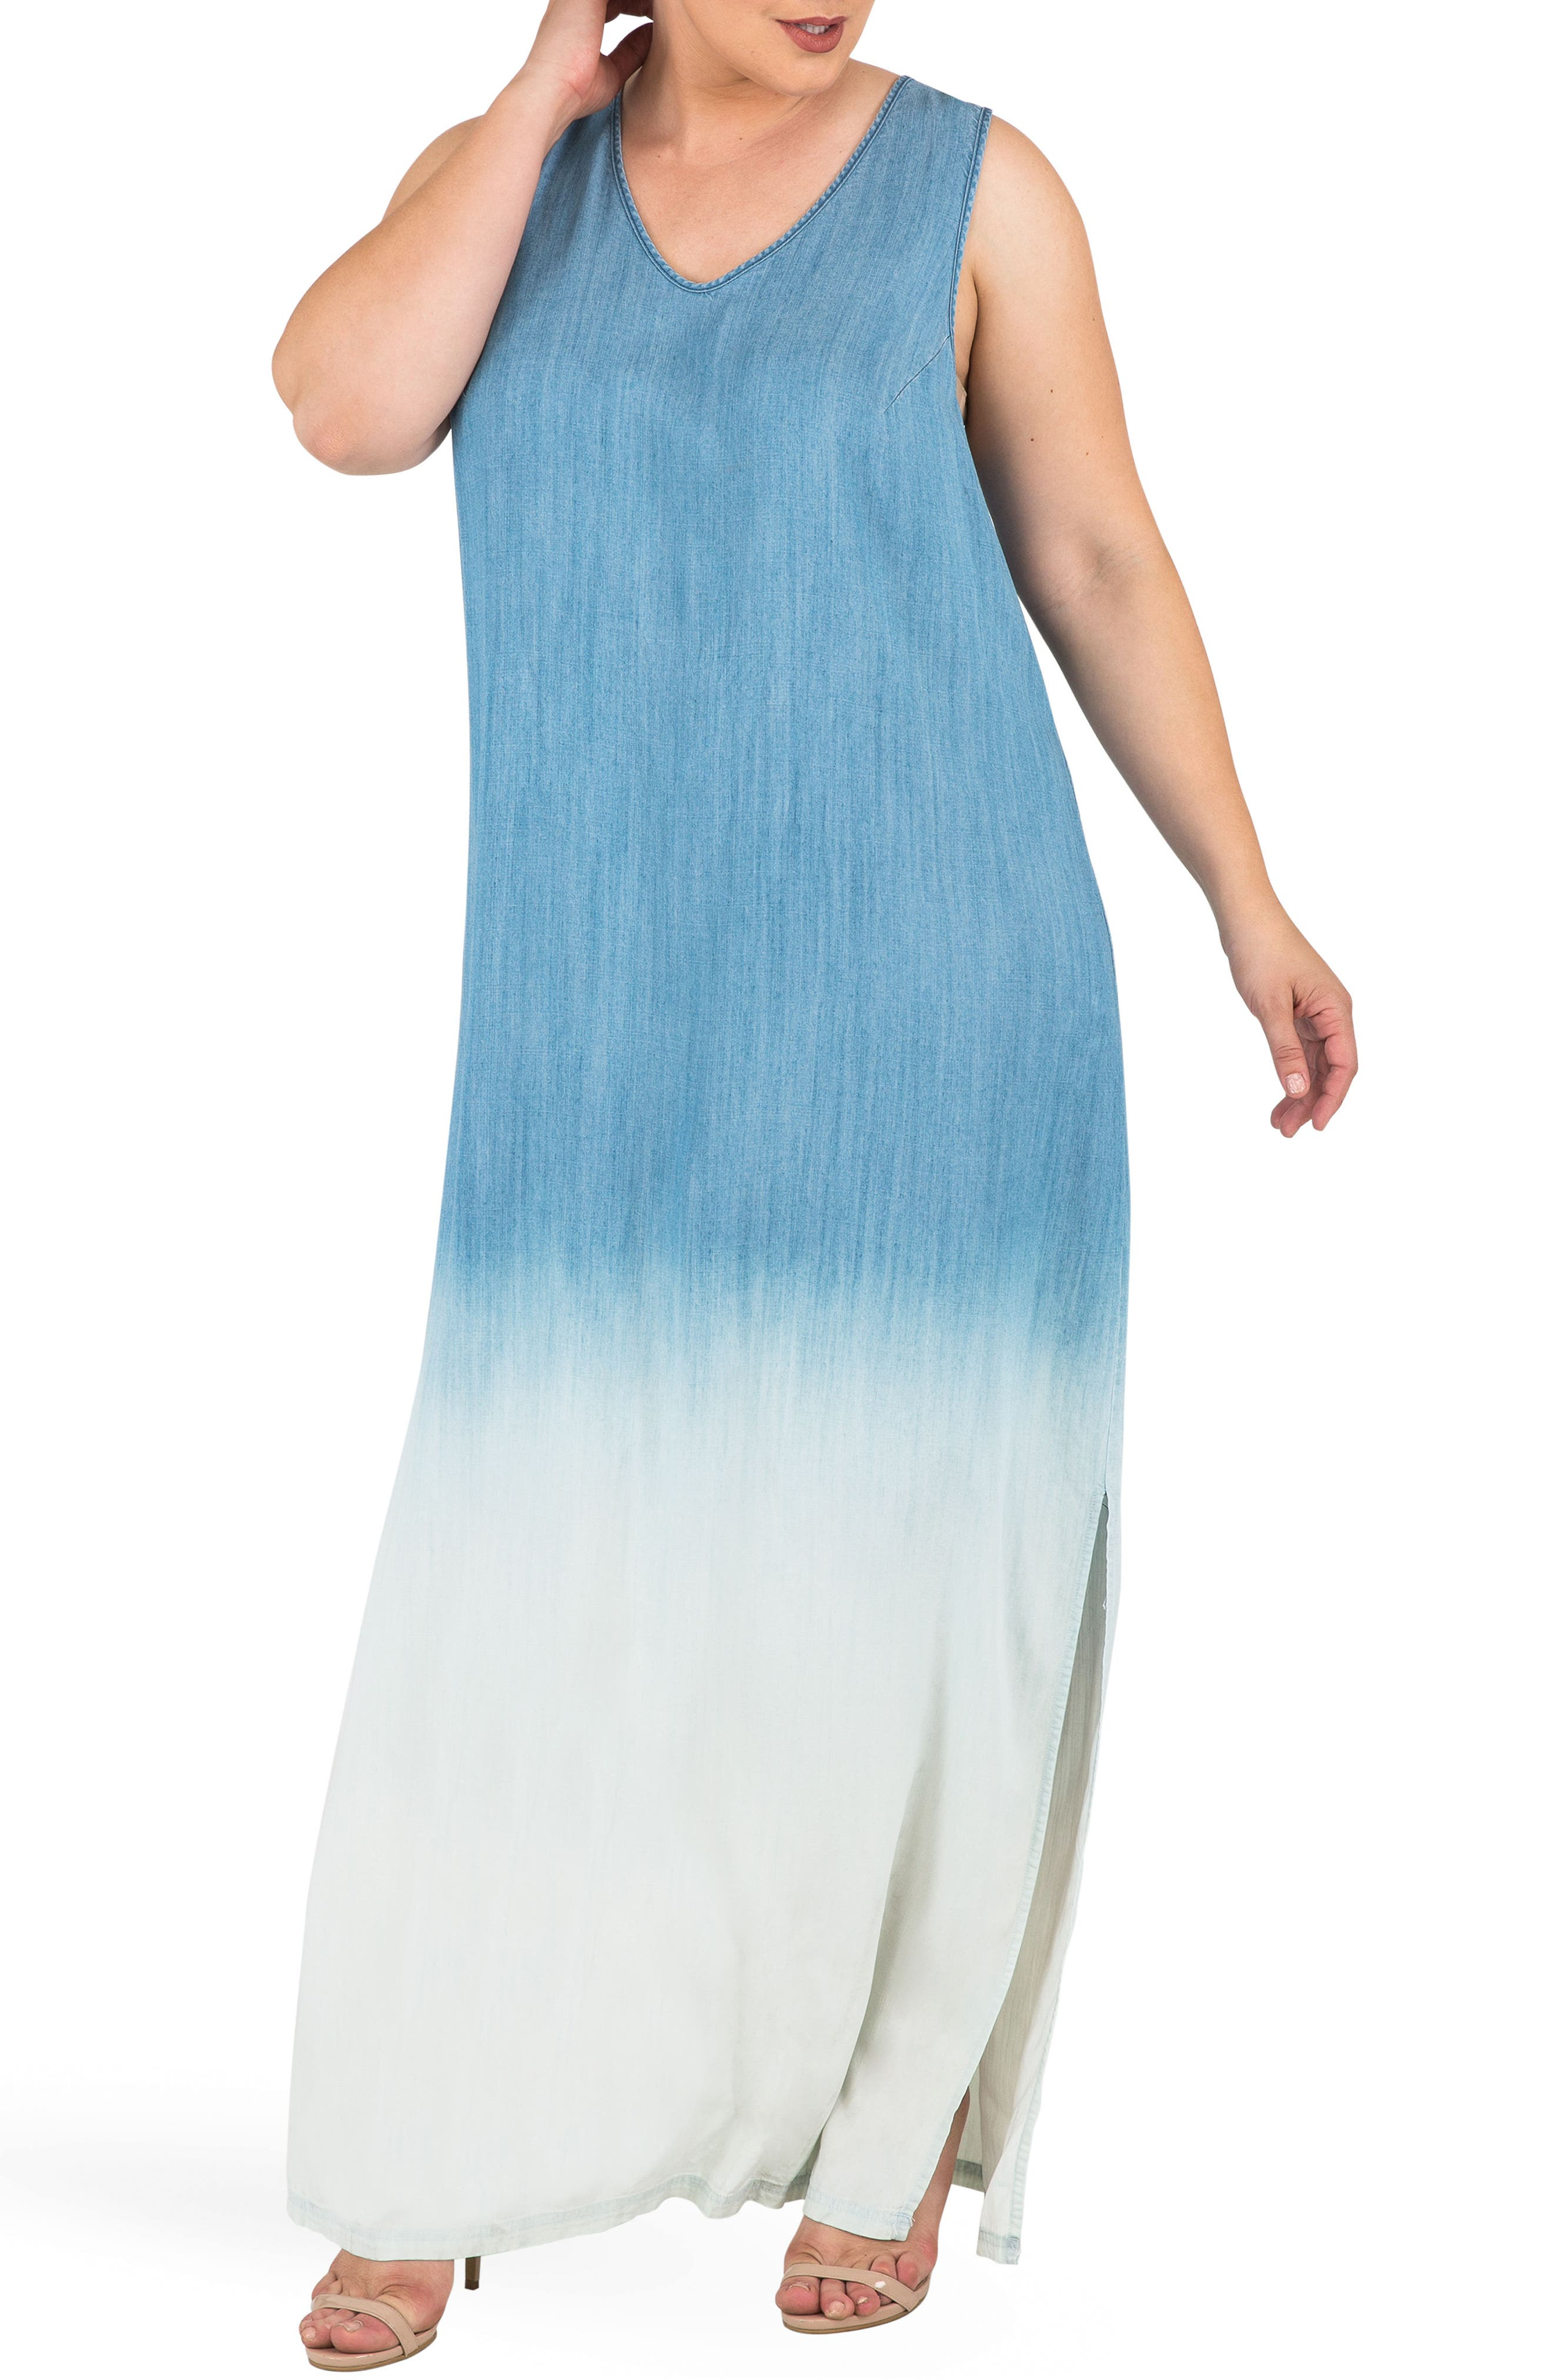 Angie Ombré Chmbray Maxi Dress,                         Main,                         color, Blue